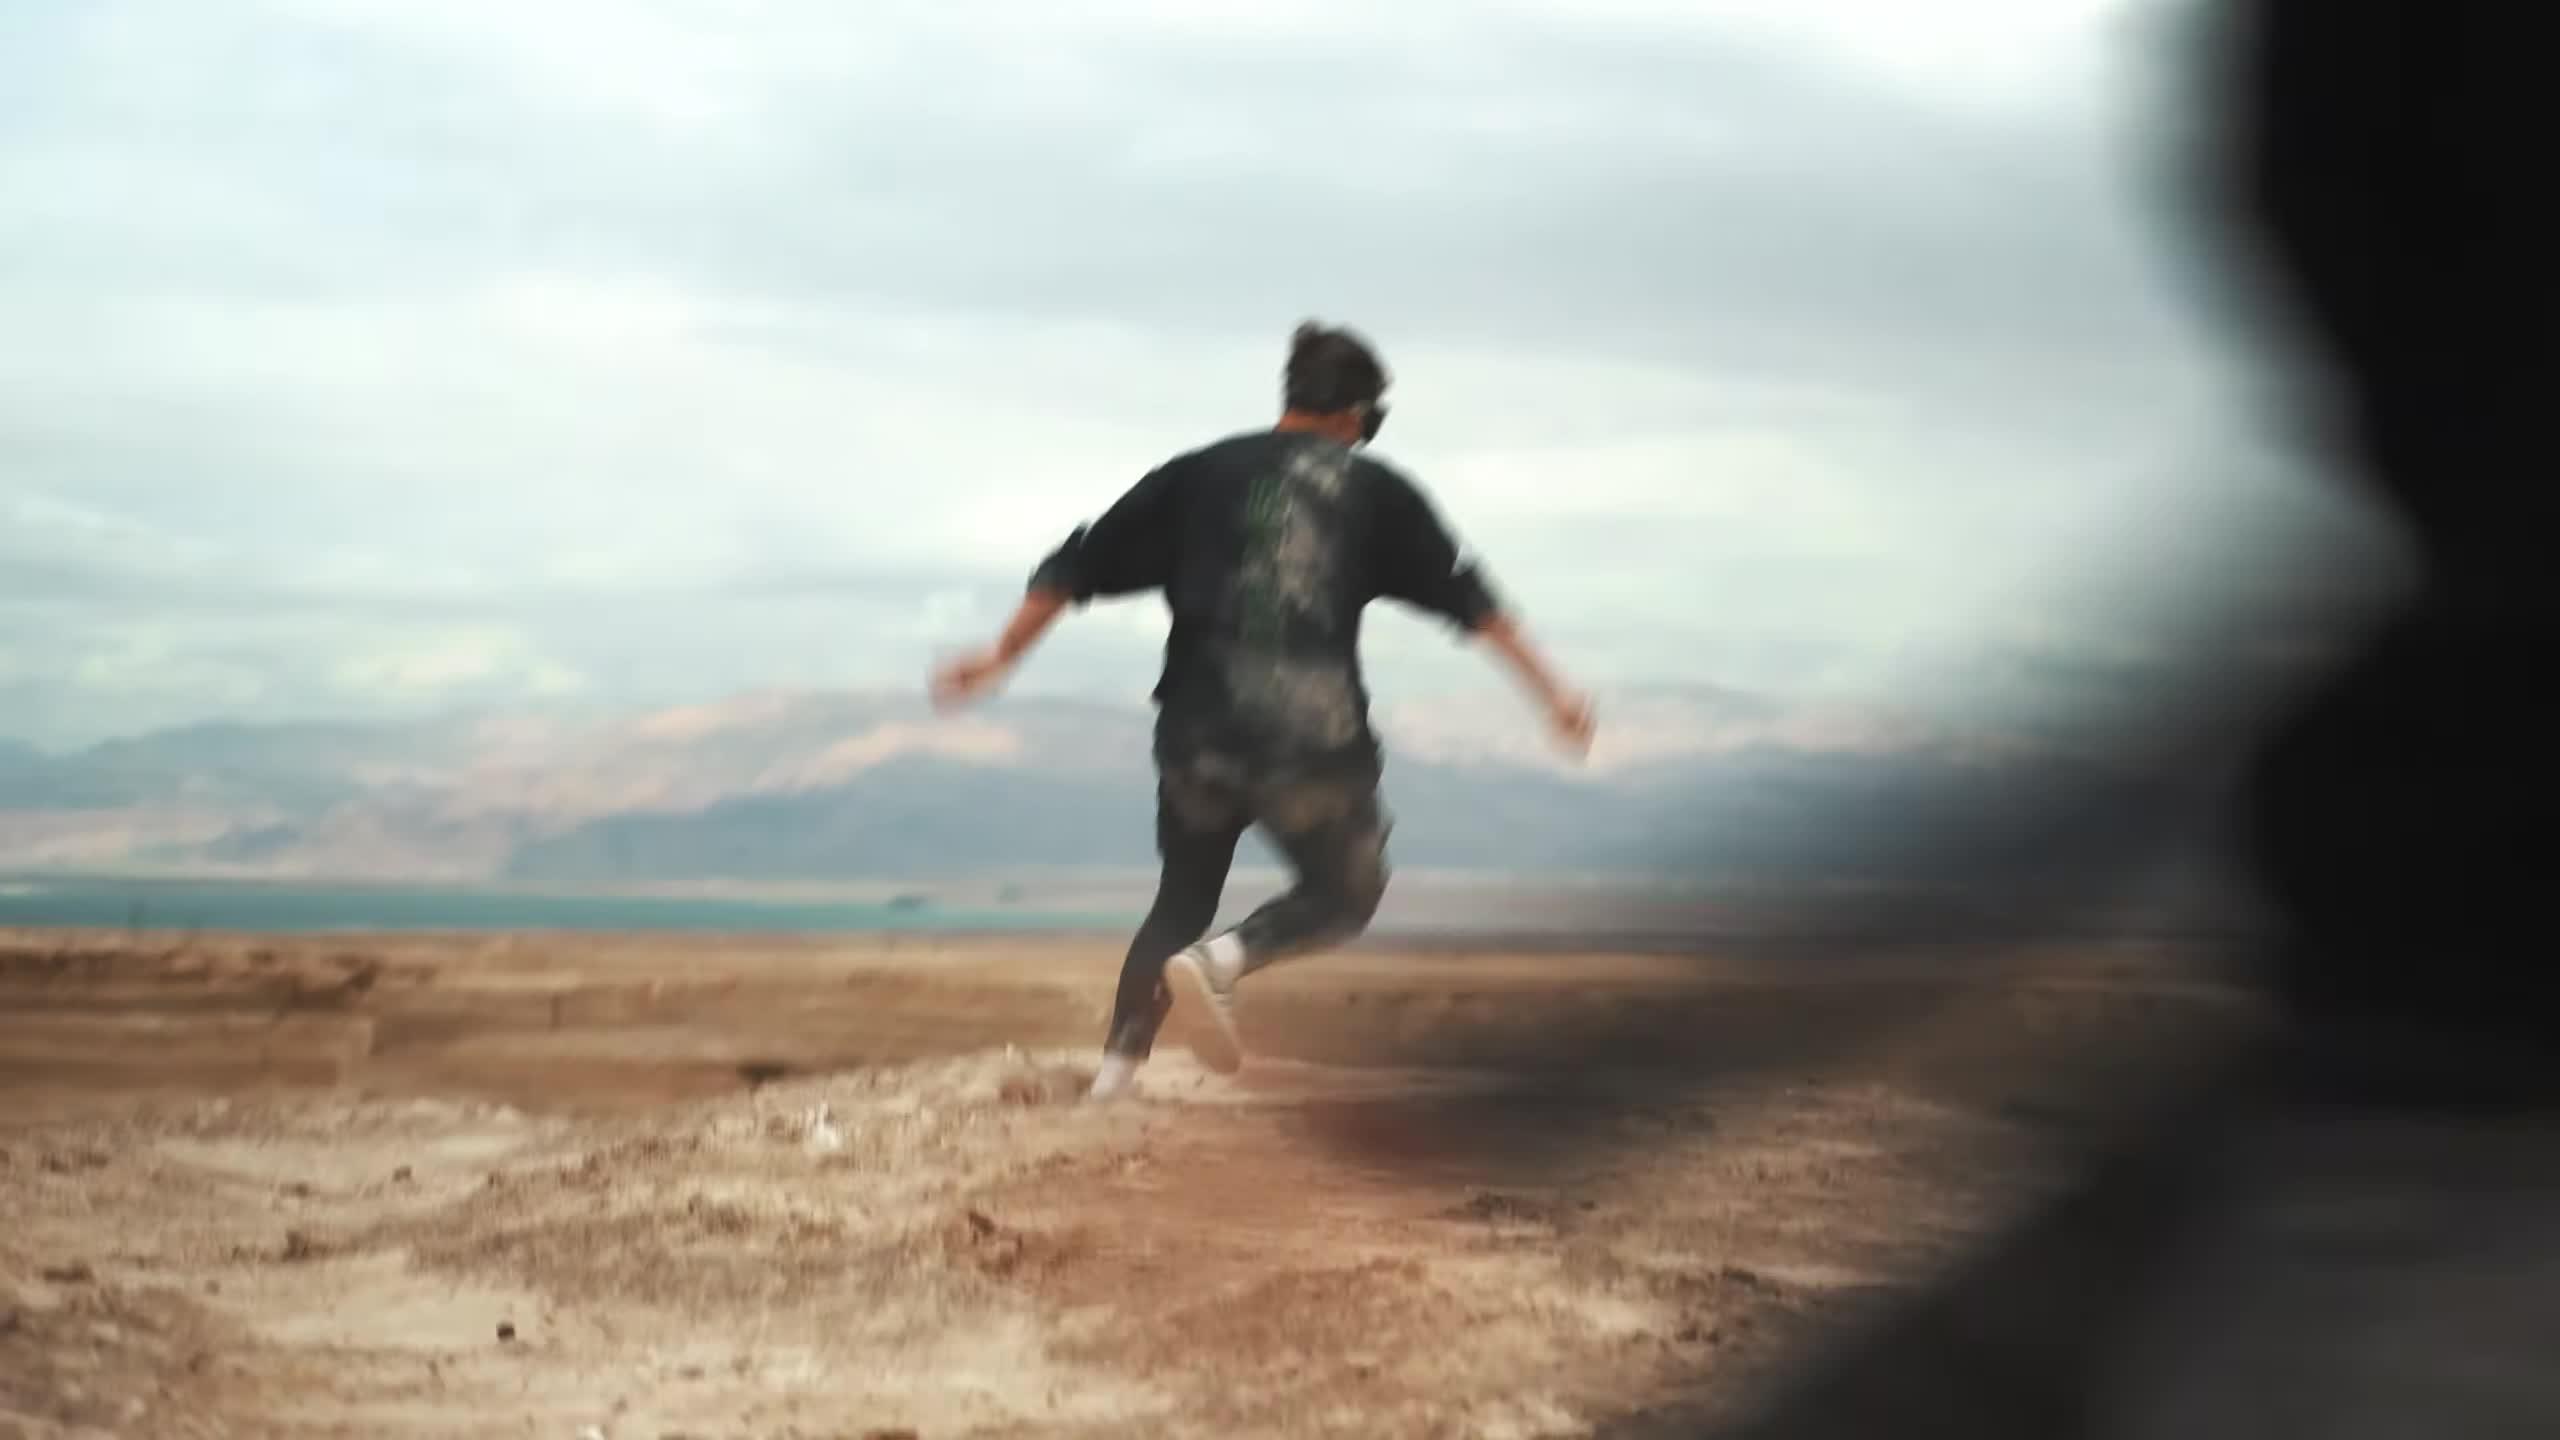 POV, Parkour, STORROR, STORROR youtube, desert, free running, masada, rampage, stunts, youtube STORROR, DESERT PARKOUR RAMPAGE GIFs